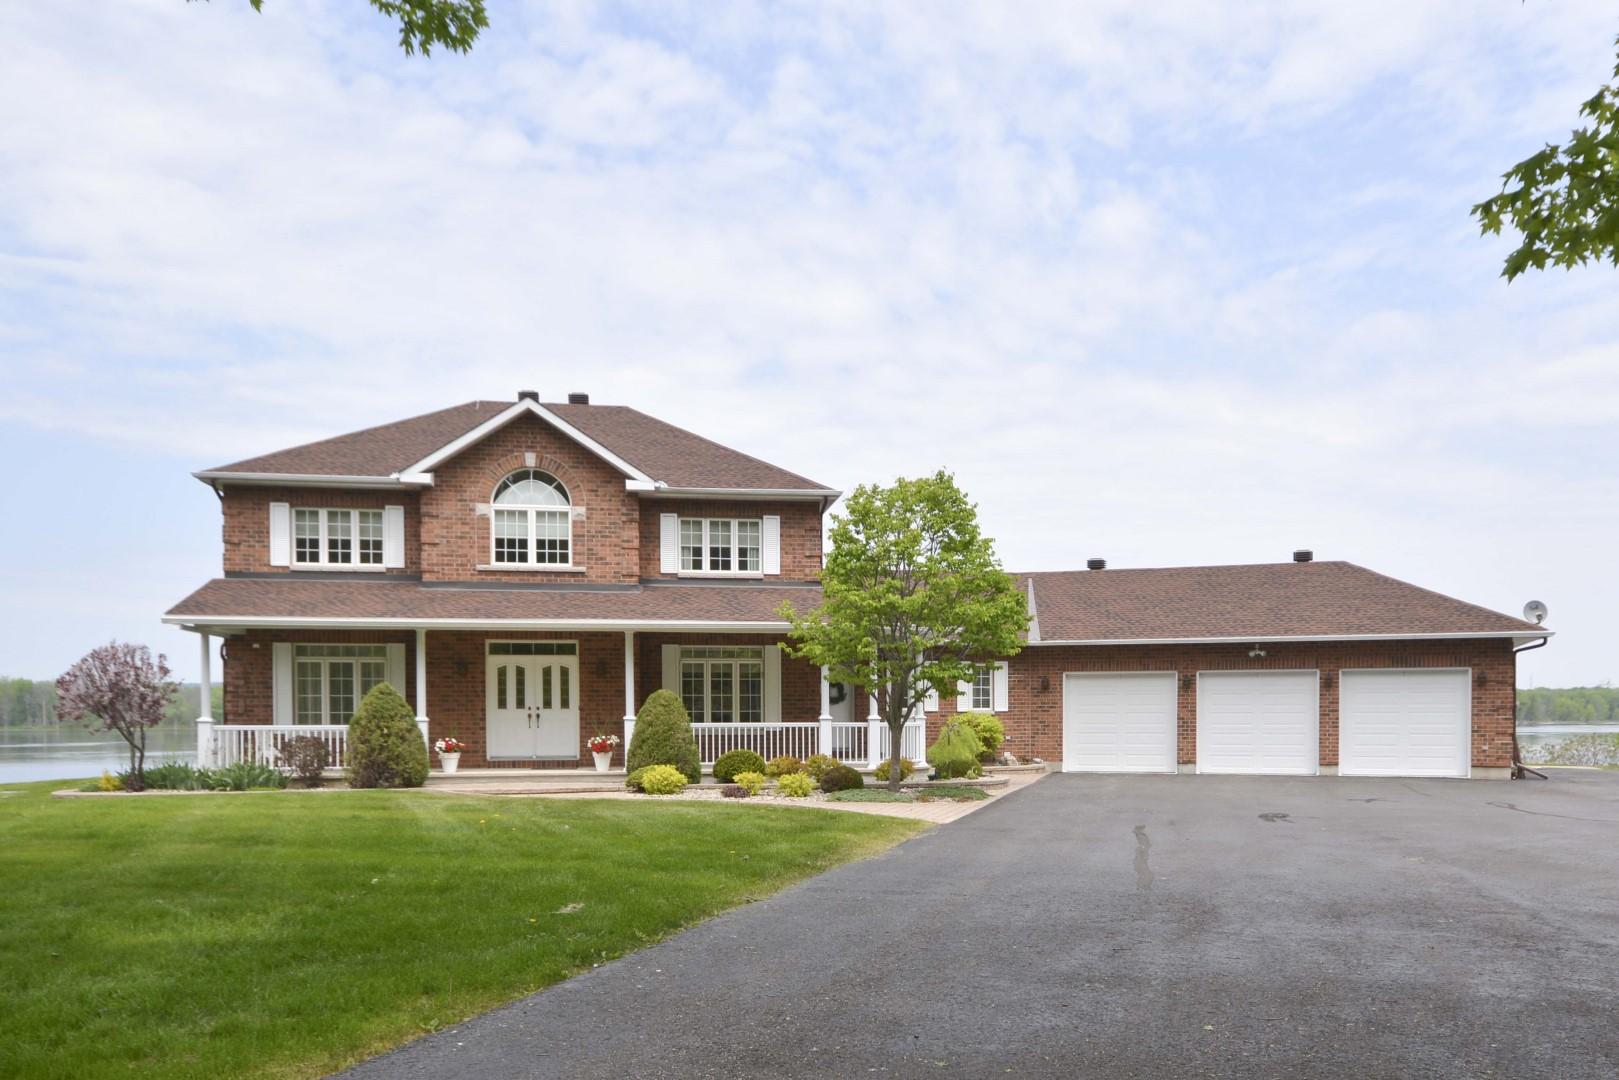 1853 Regional 174 Road | Luxury Home on the Ottawa River